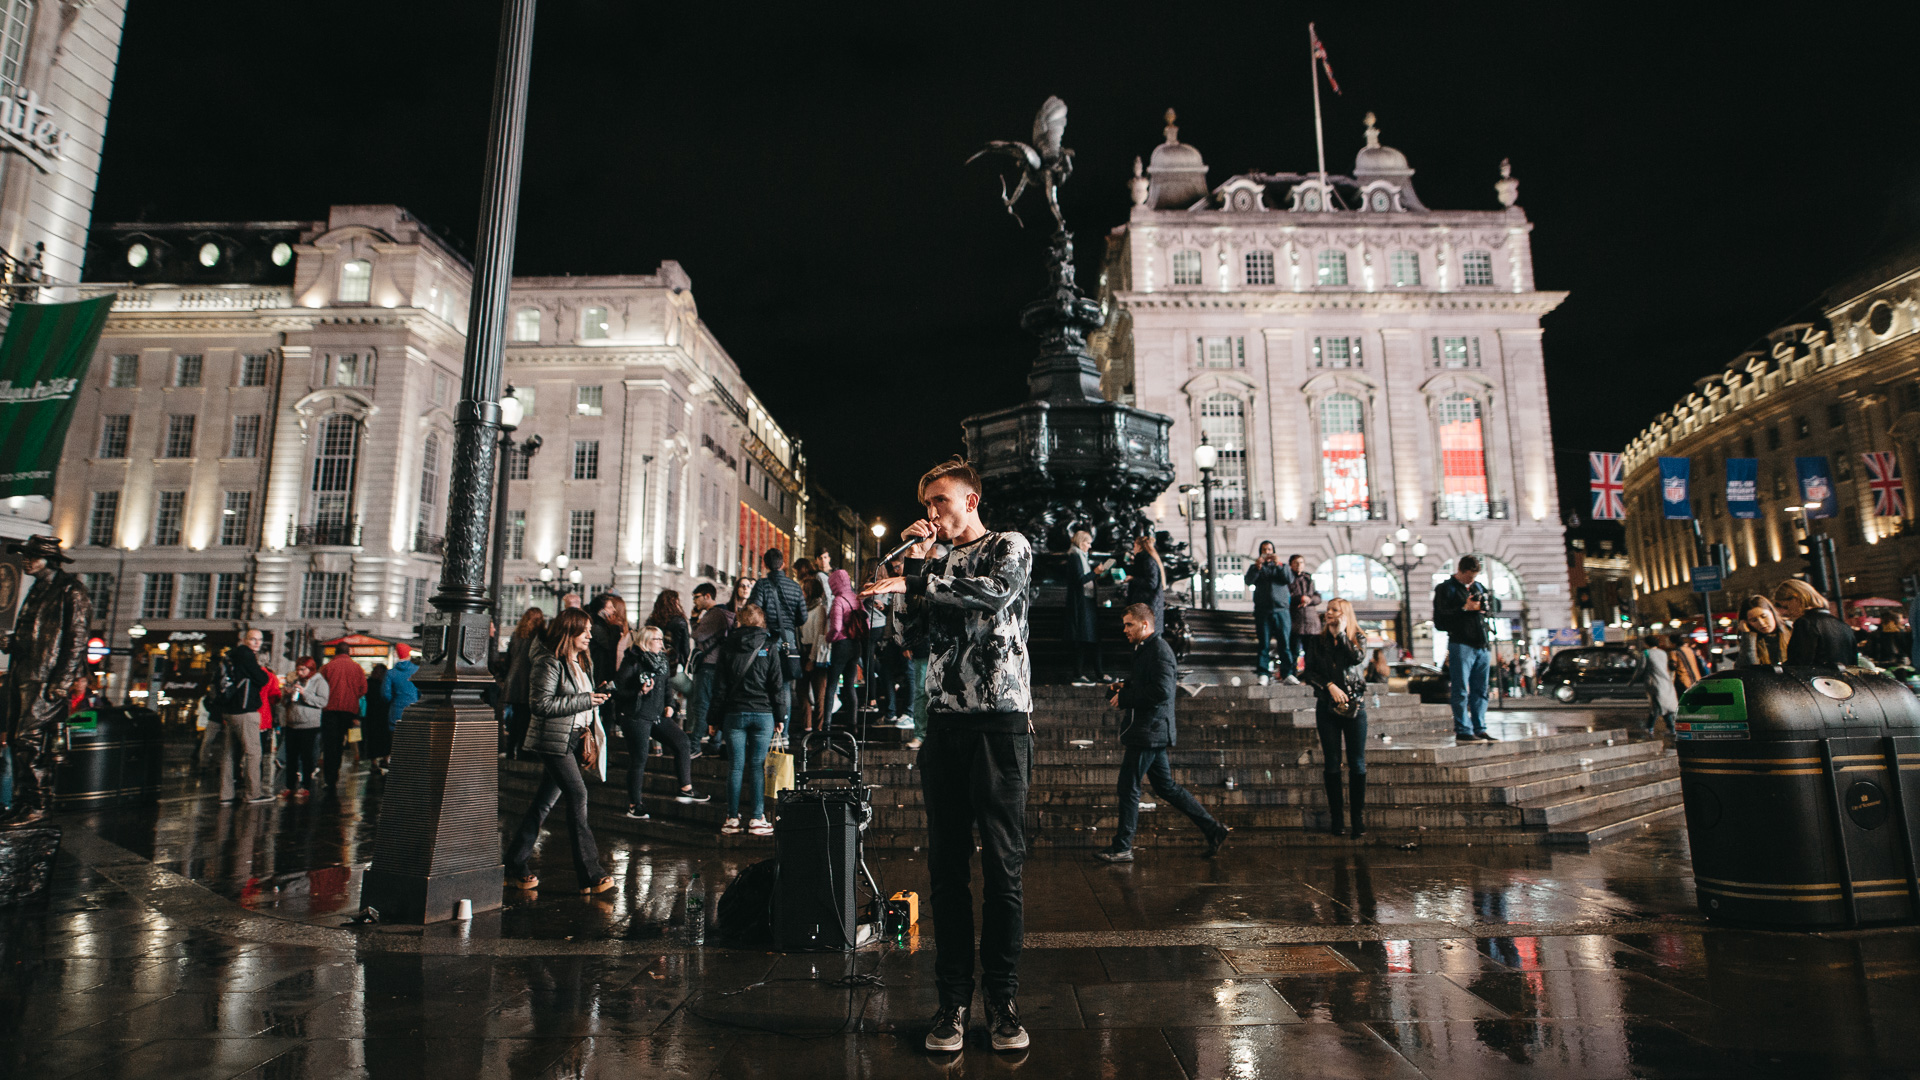 gabor_lenart_london_photographer_street_blogger_lifestyle_img_5231